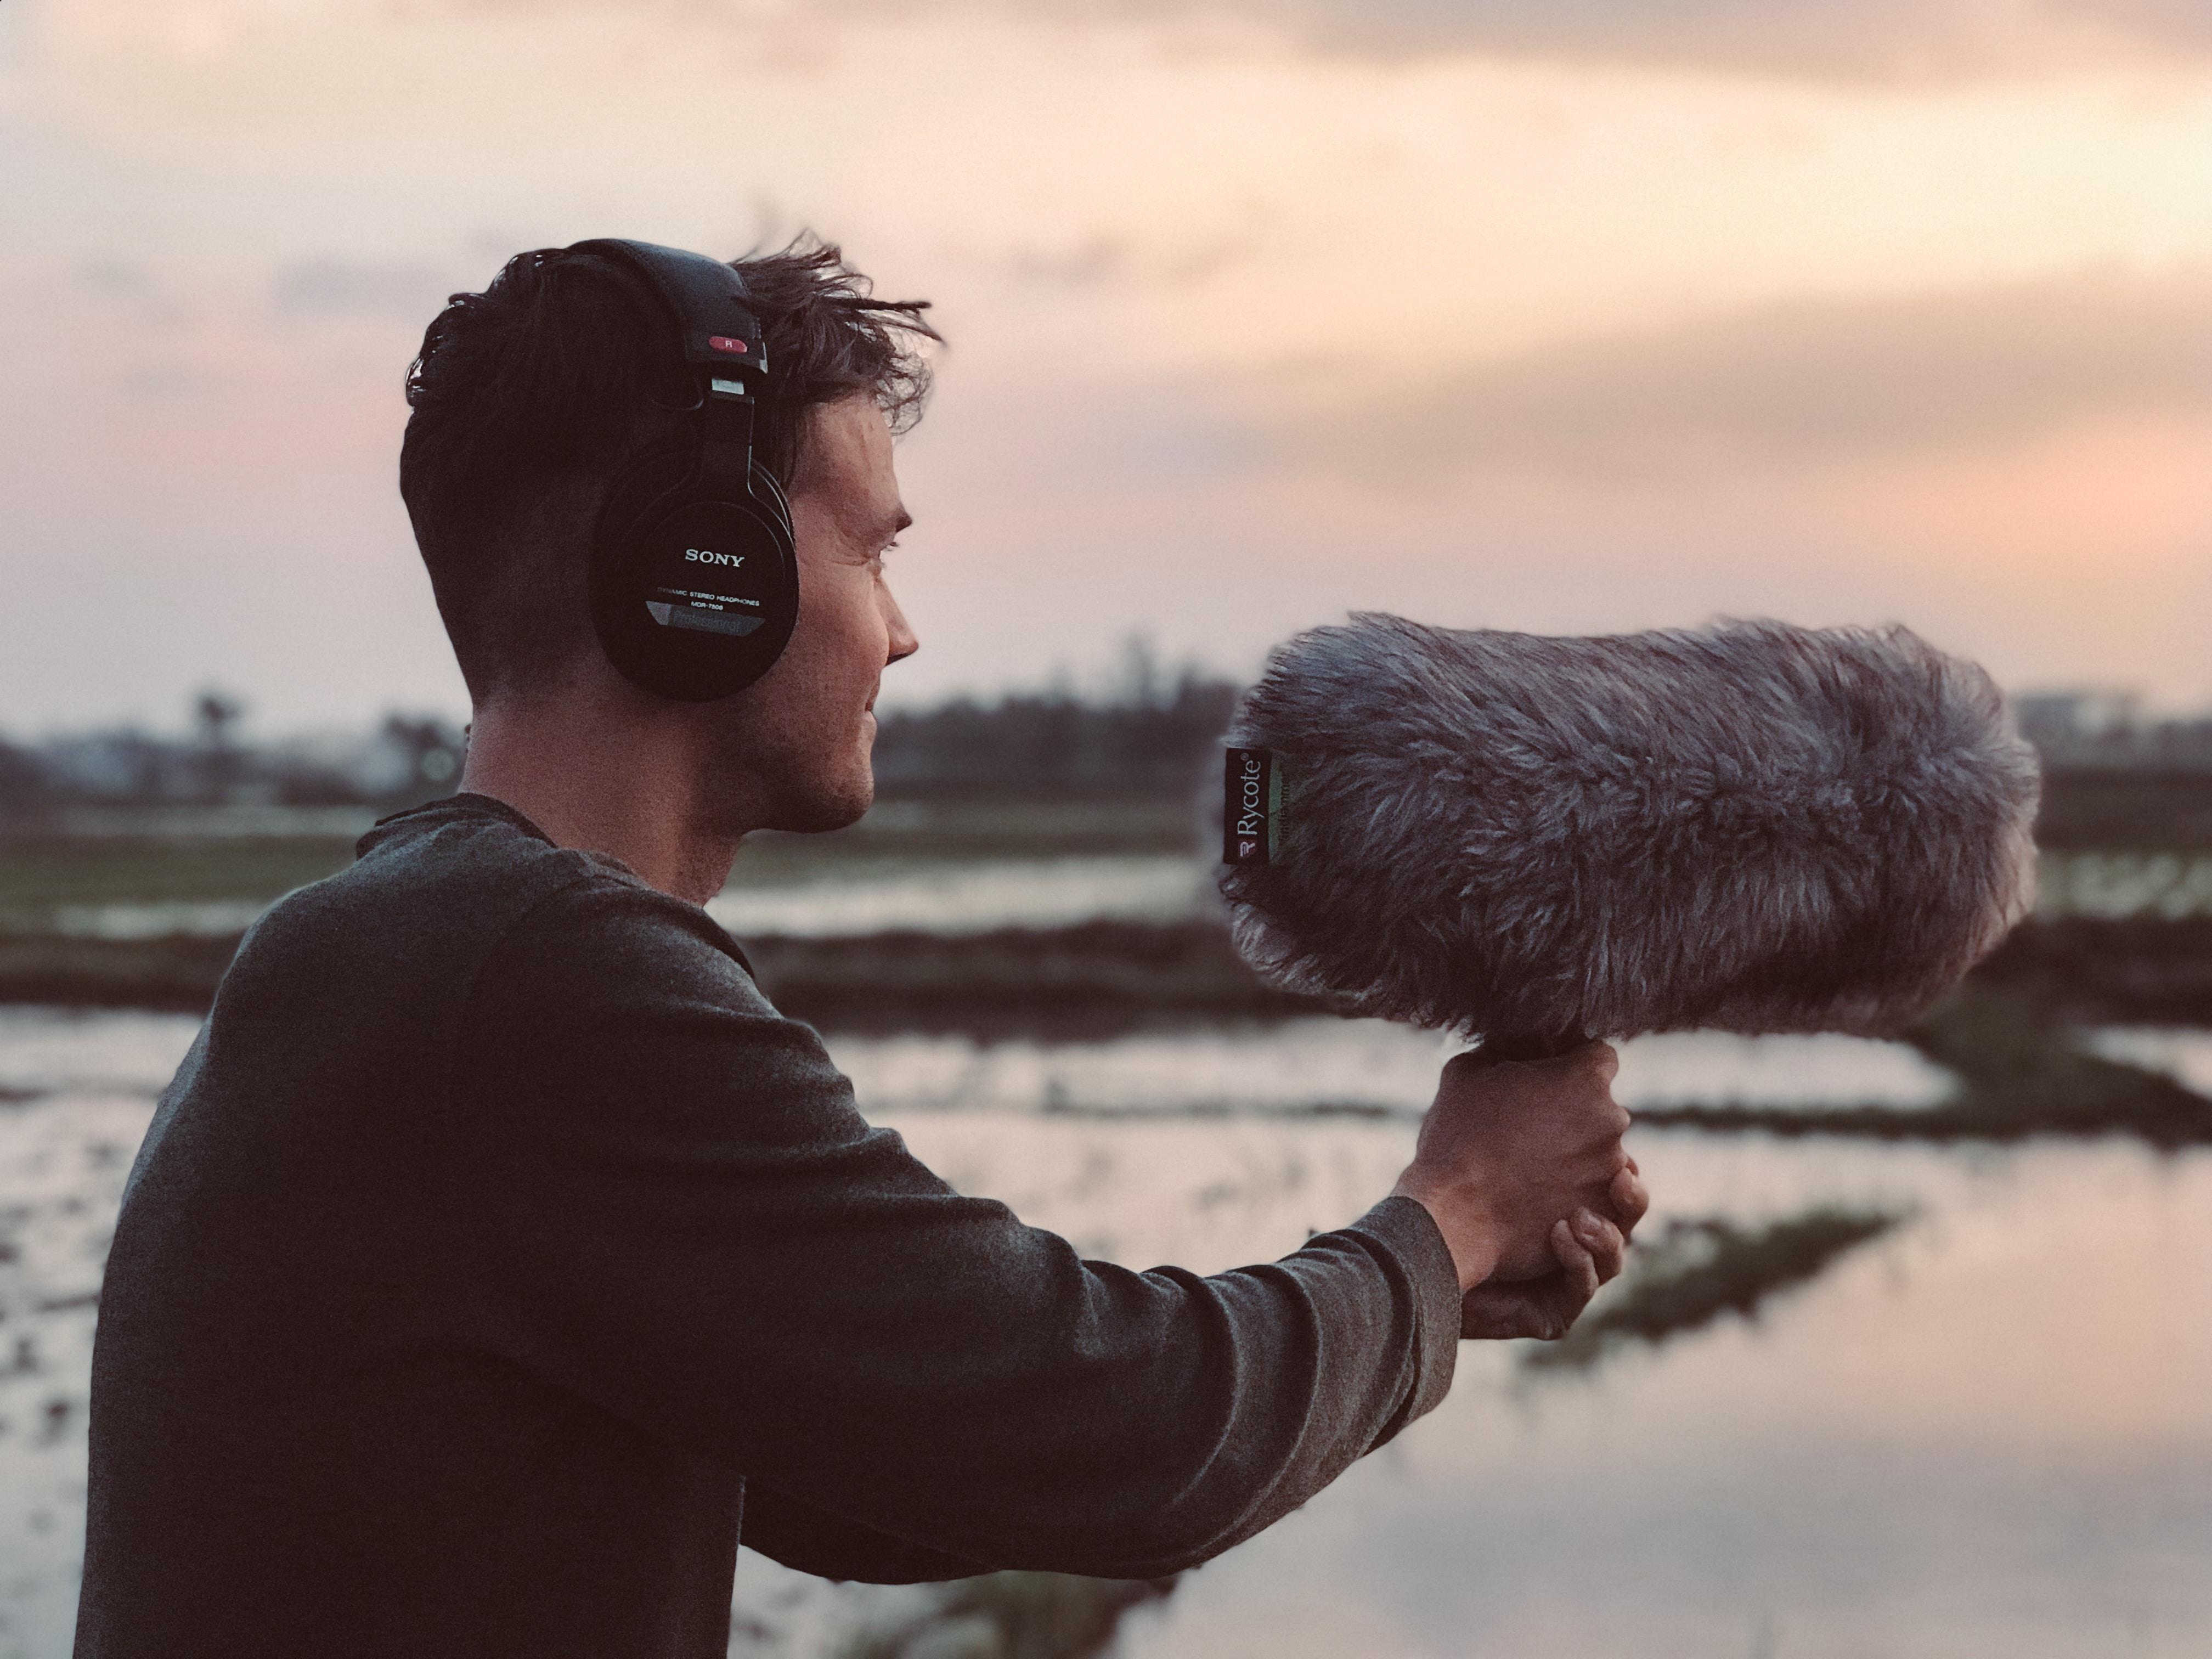 Acoustics: Consultancy - Man surveying environmental noise